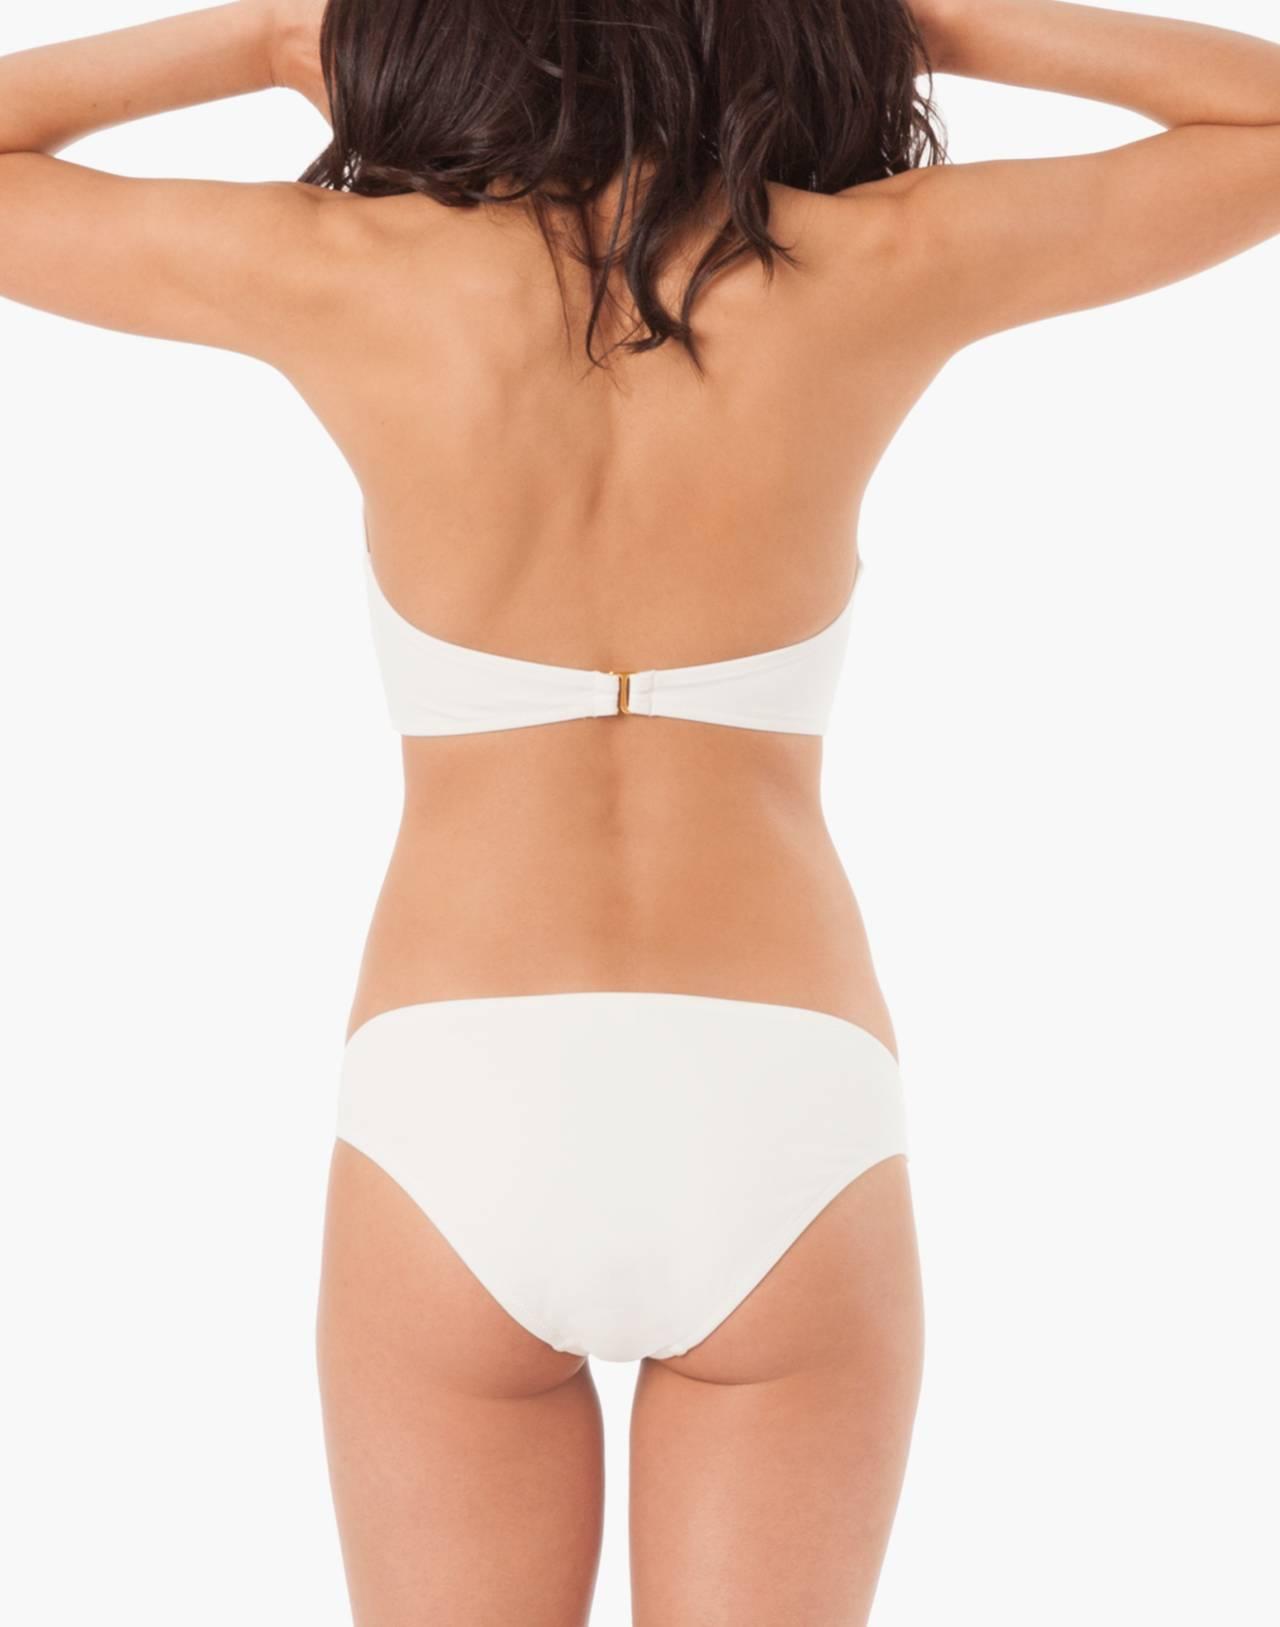 LIVELY™ Bandeau Bikini Top in white image 2